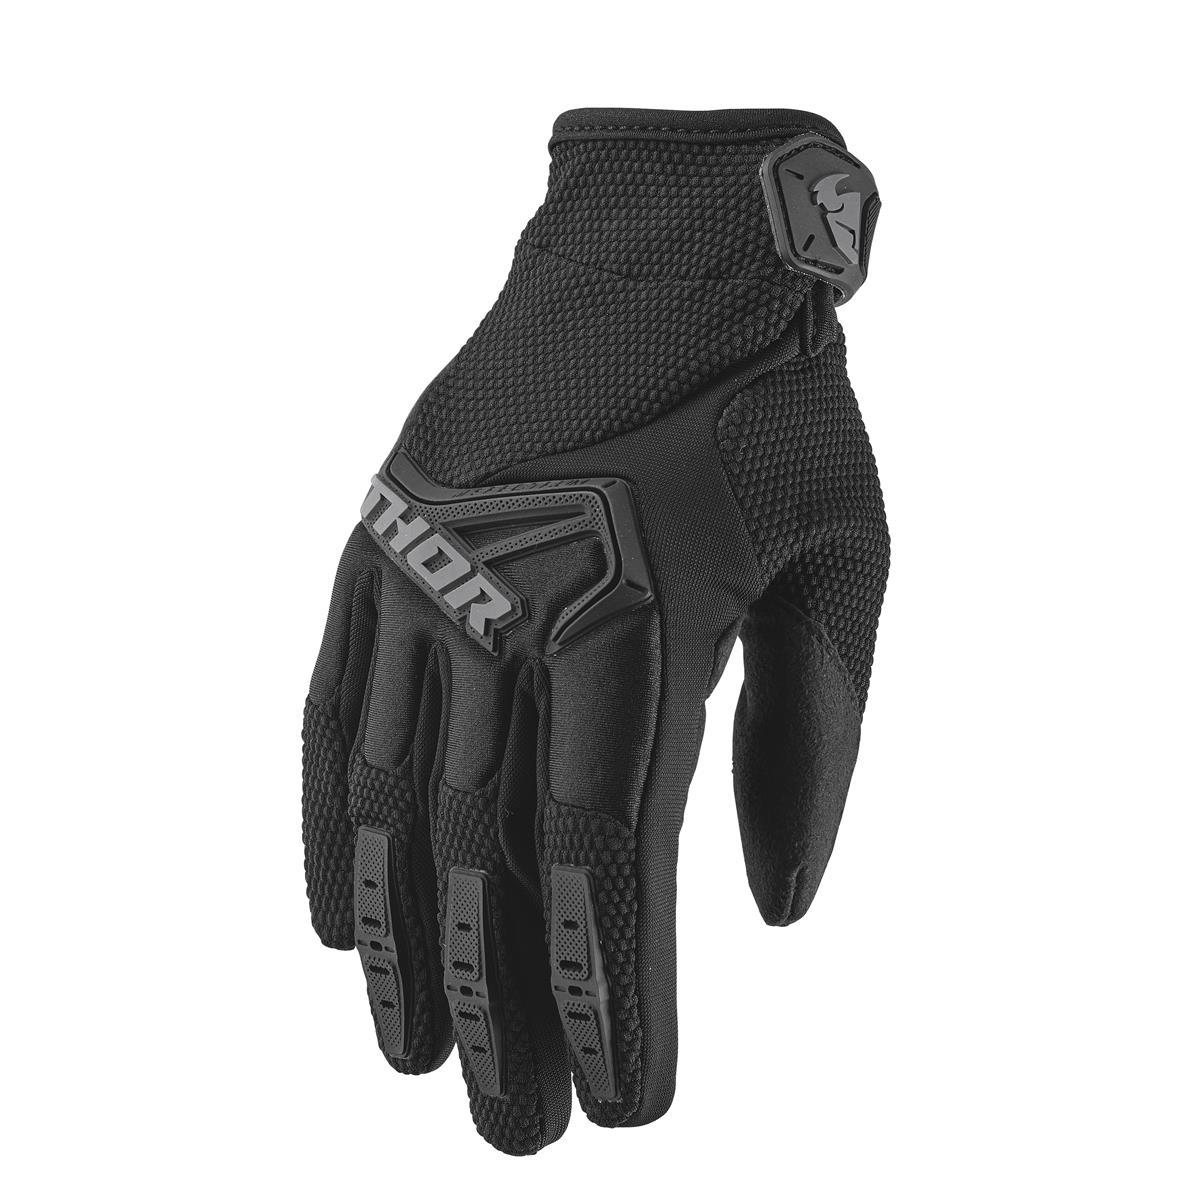 Thor Handschuhe Spectrum S9 - Schwarz